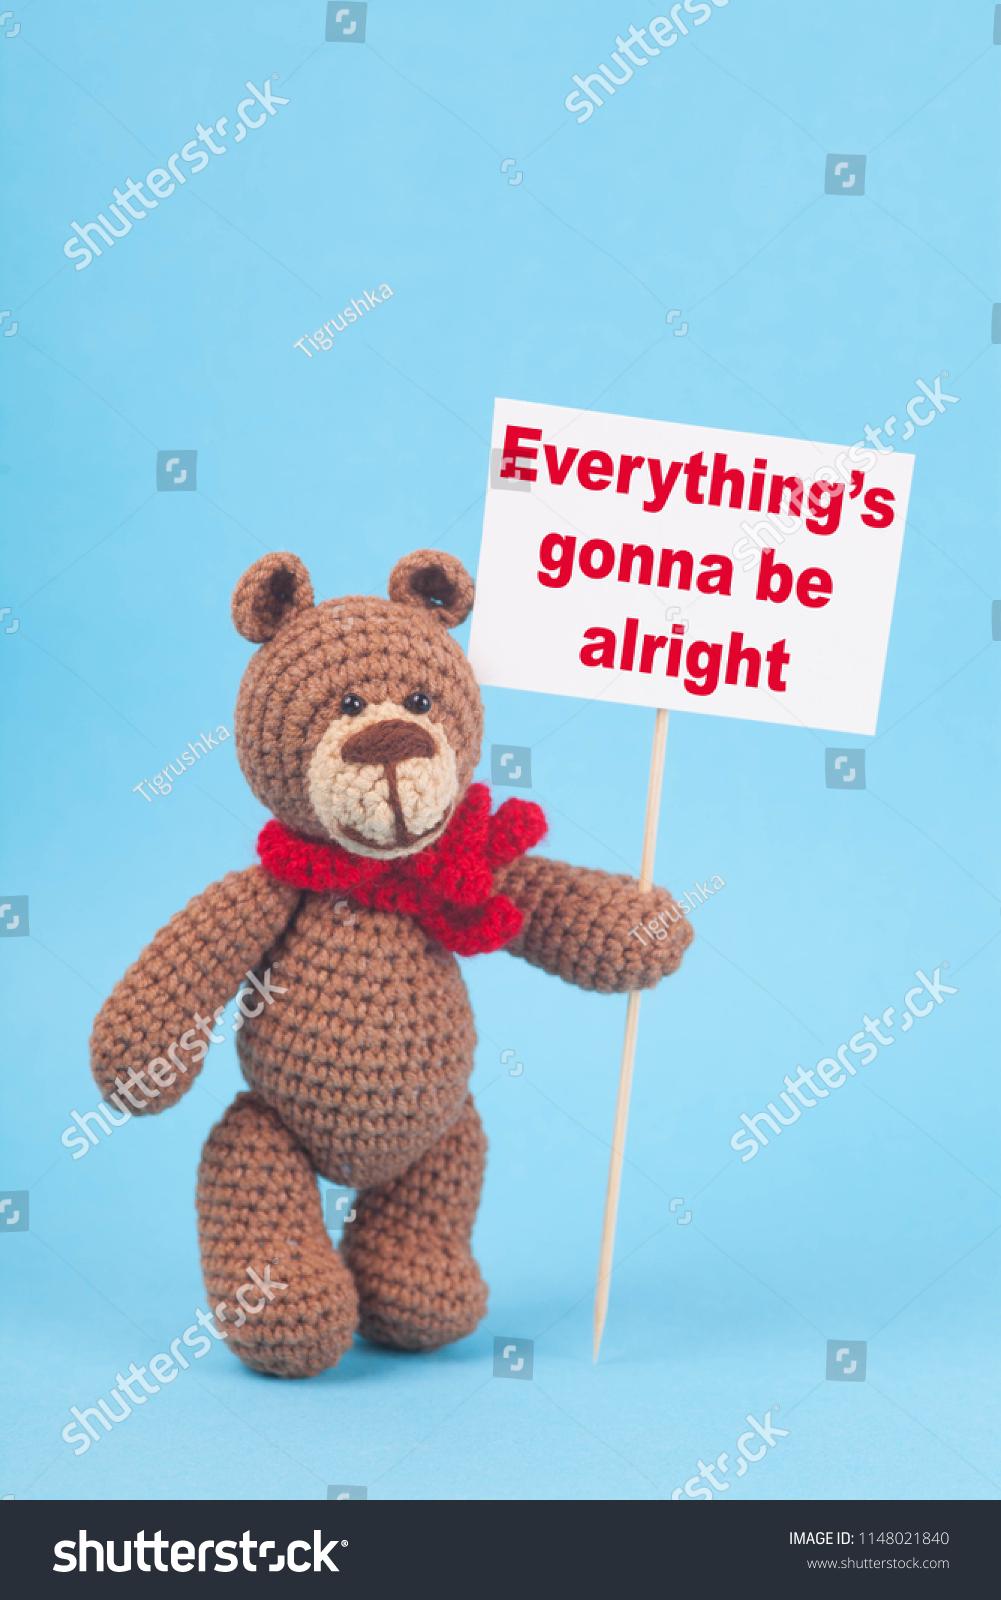 Crochet pattern Teddy bear amigurumi | Amiguroom Toys | 1600x1001